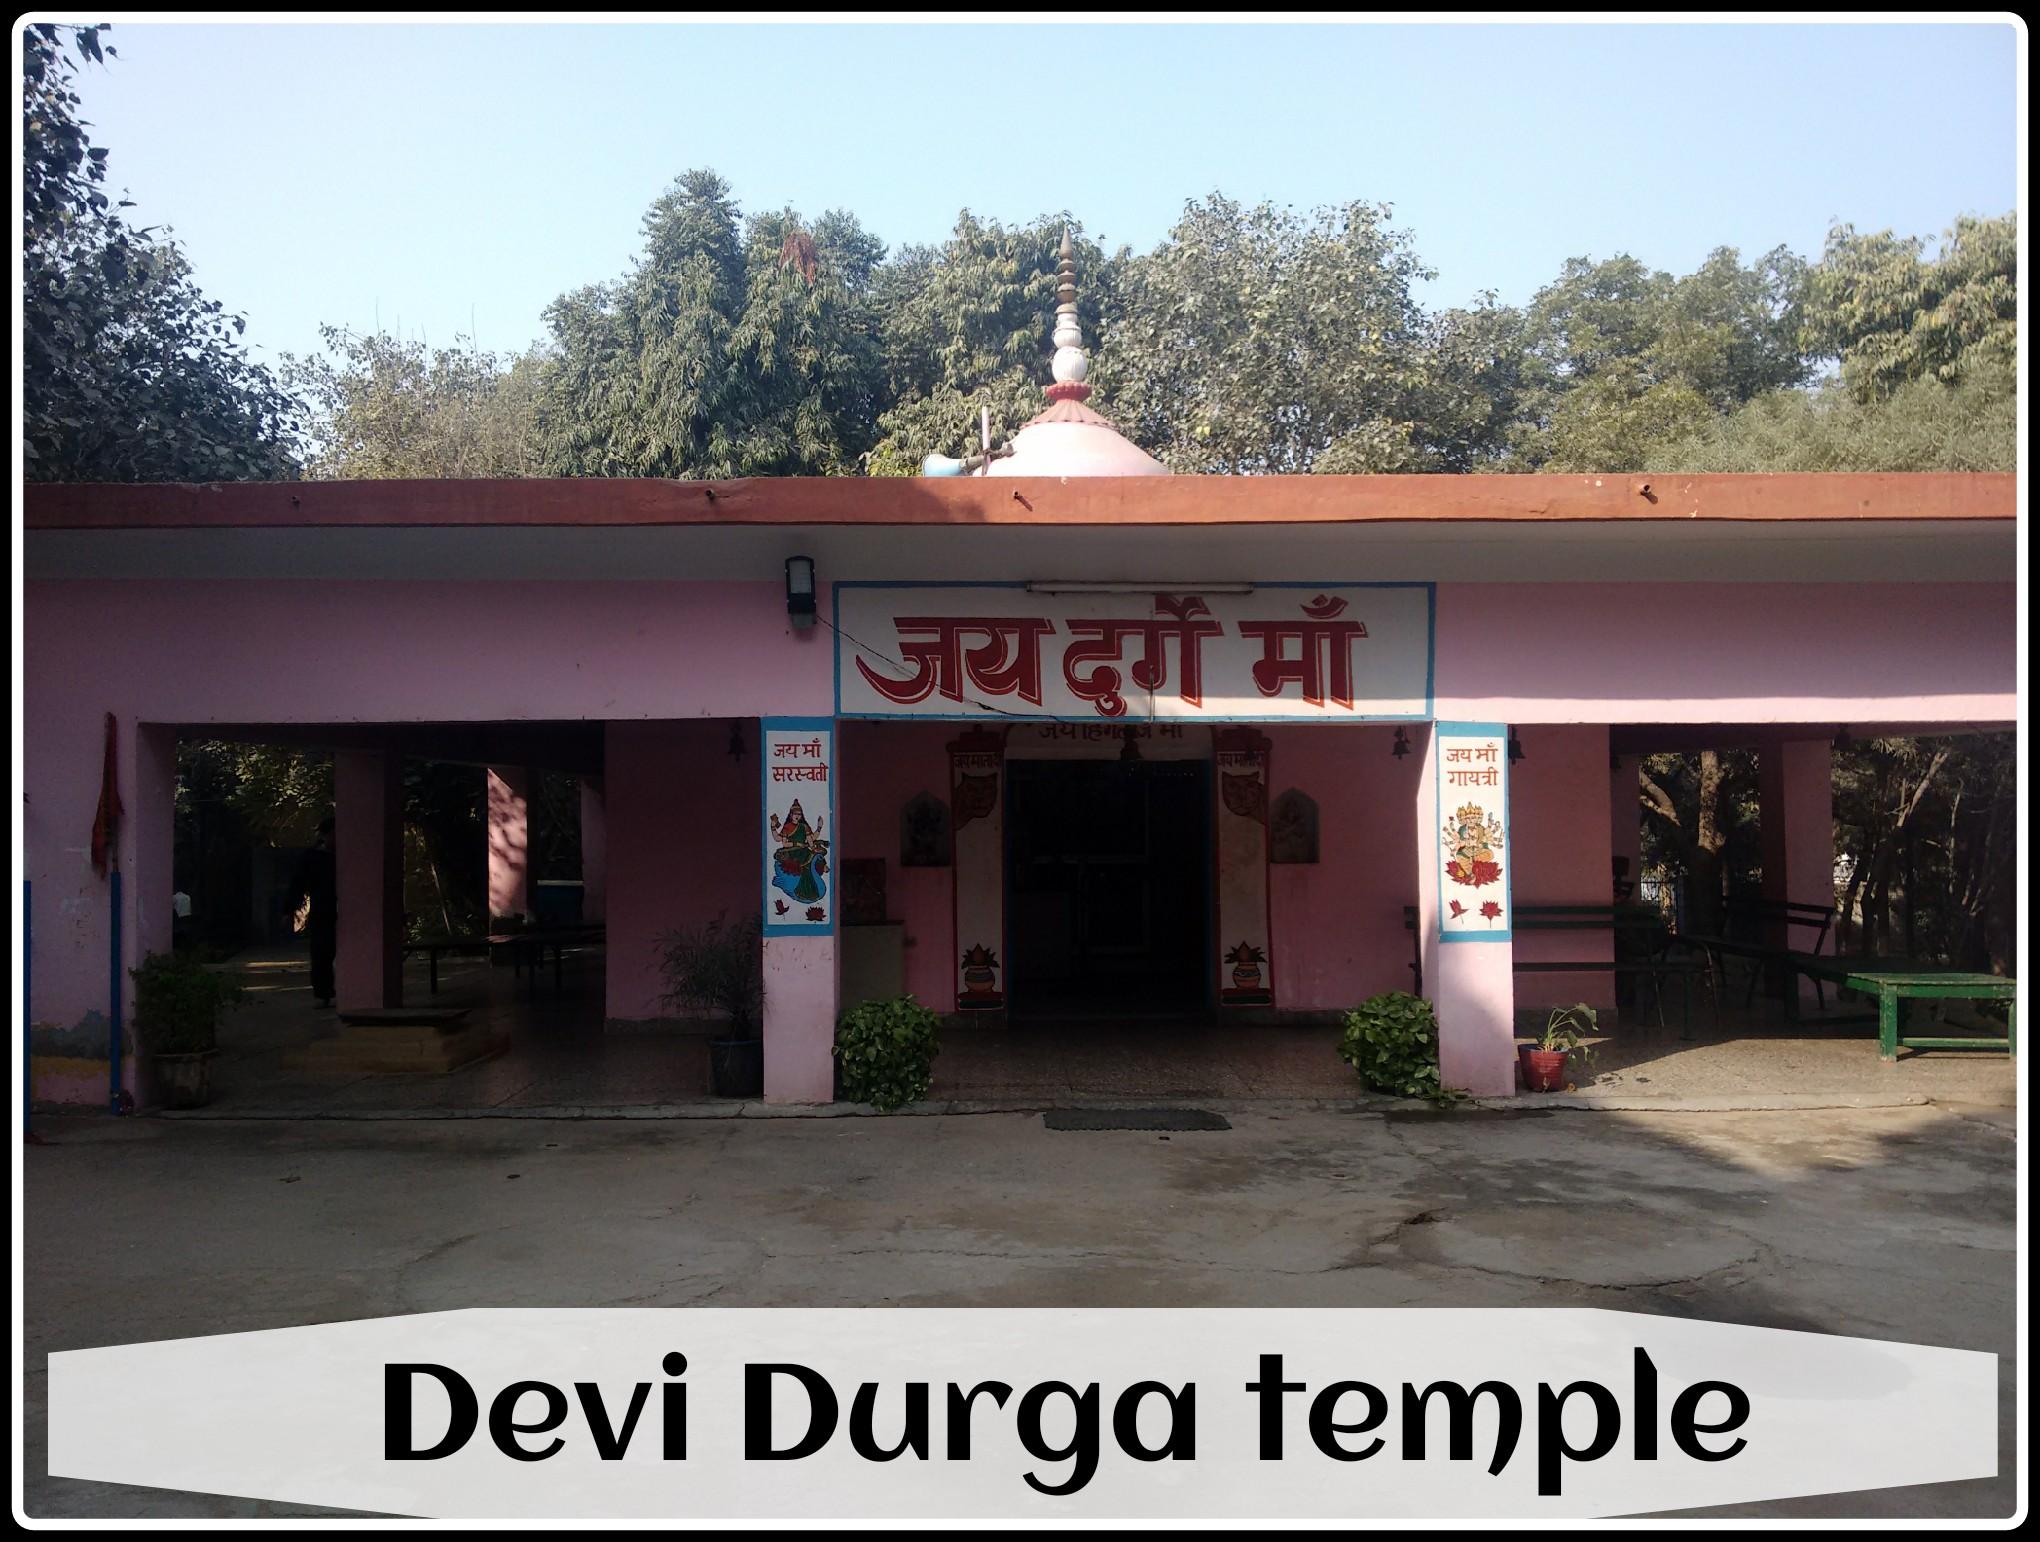 The Durga Temple